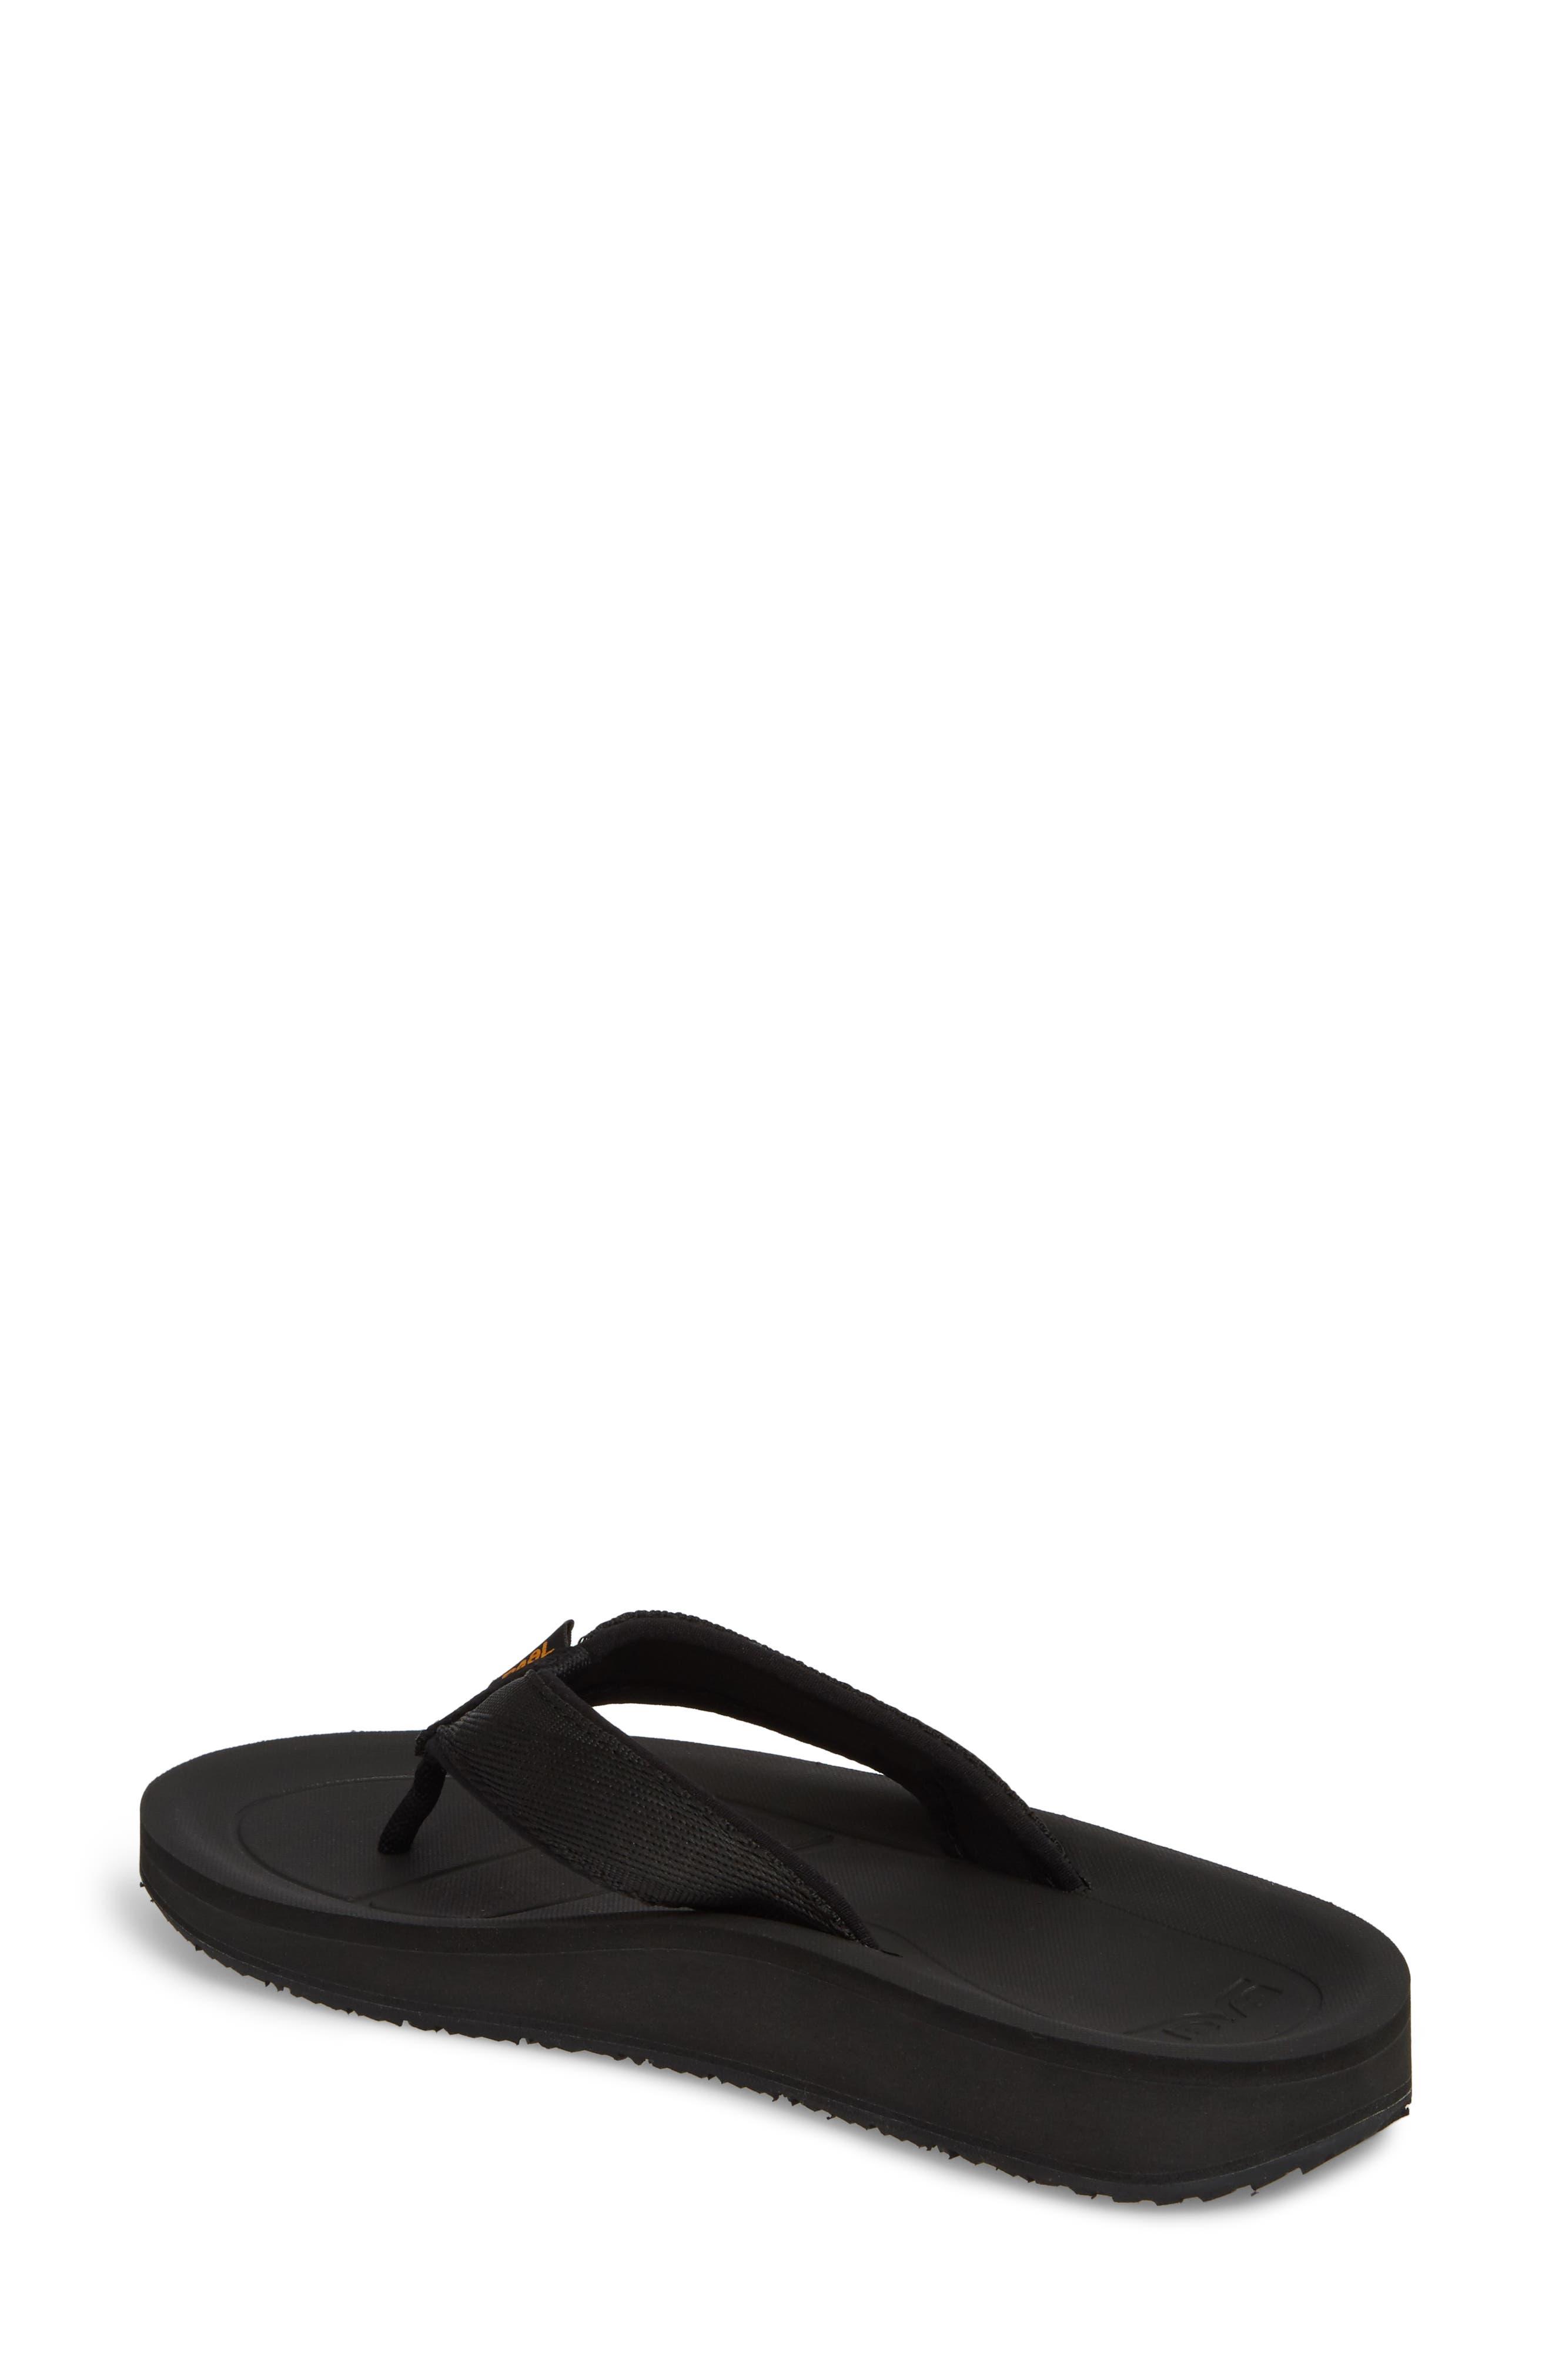 Flip Premier Sandal,                             Alternate thumbnail 2, color,                             001